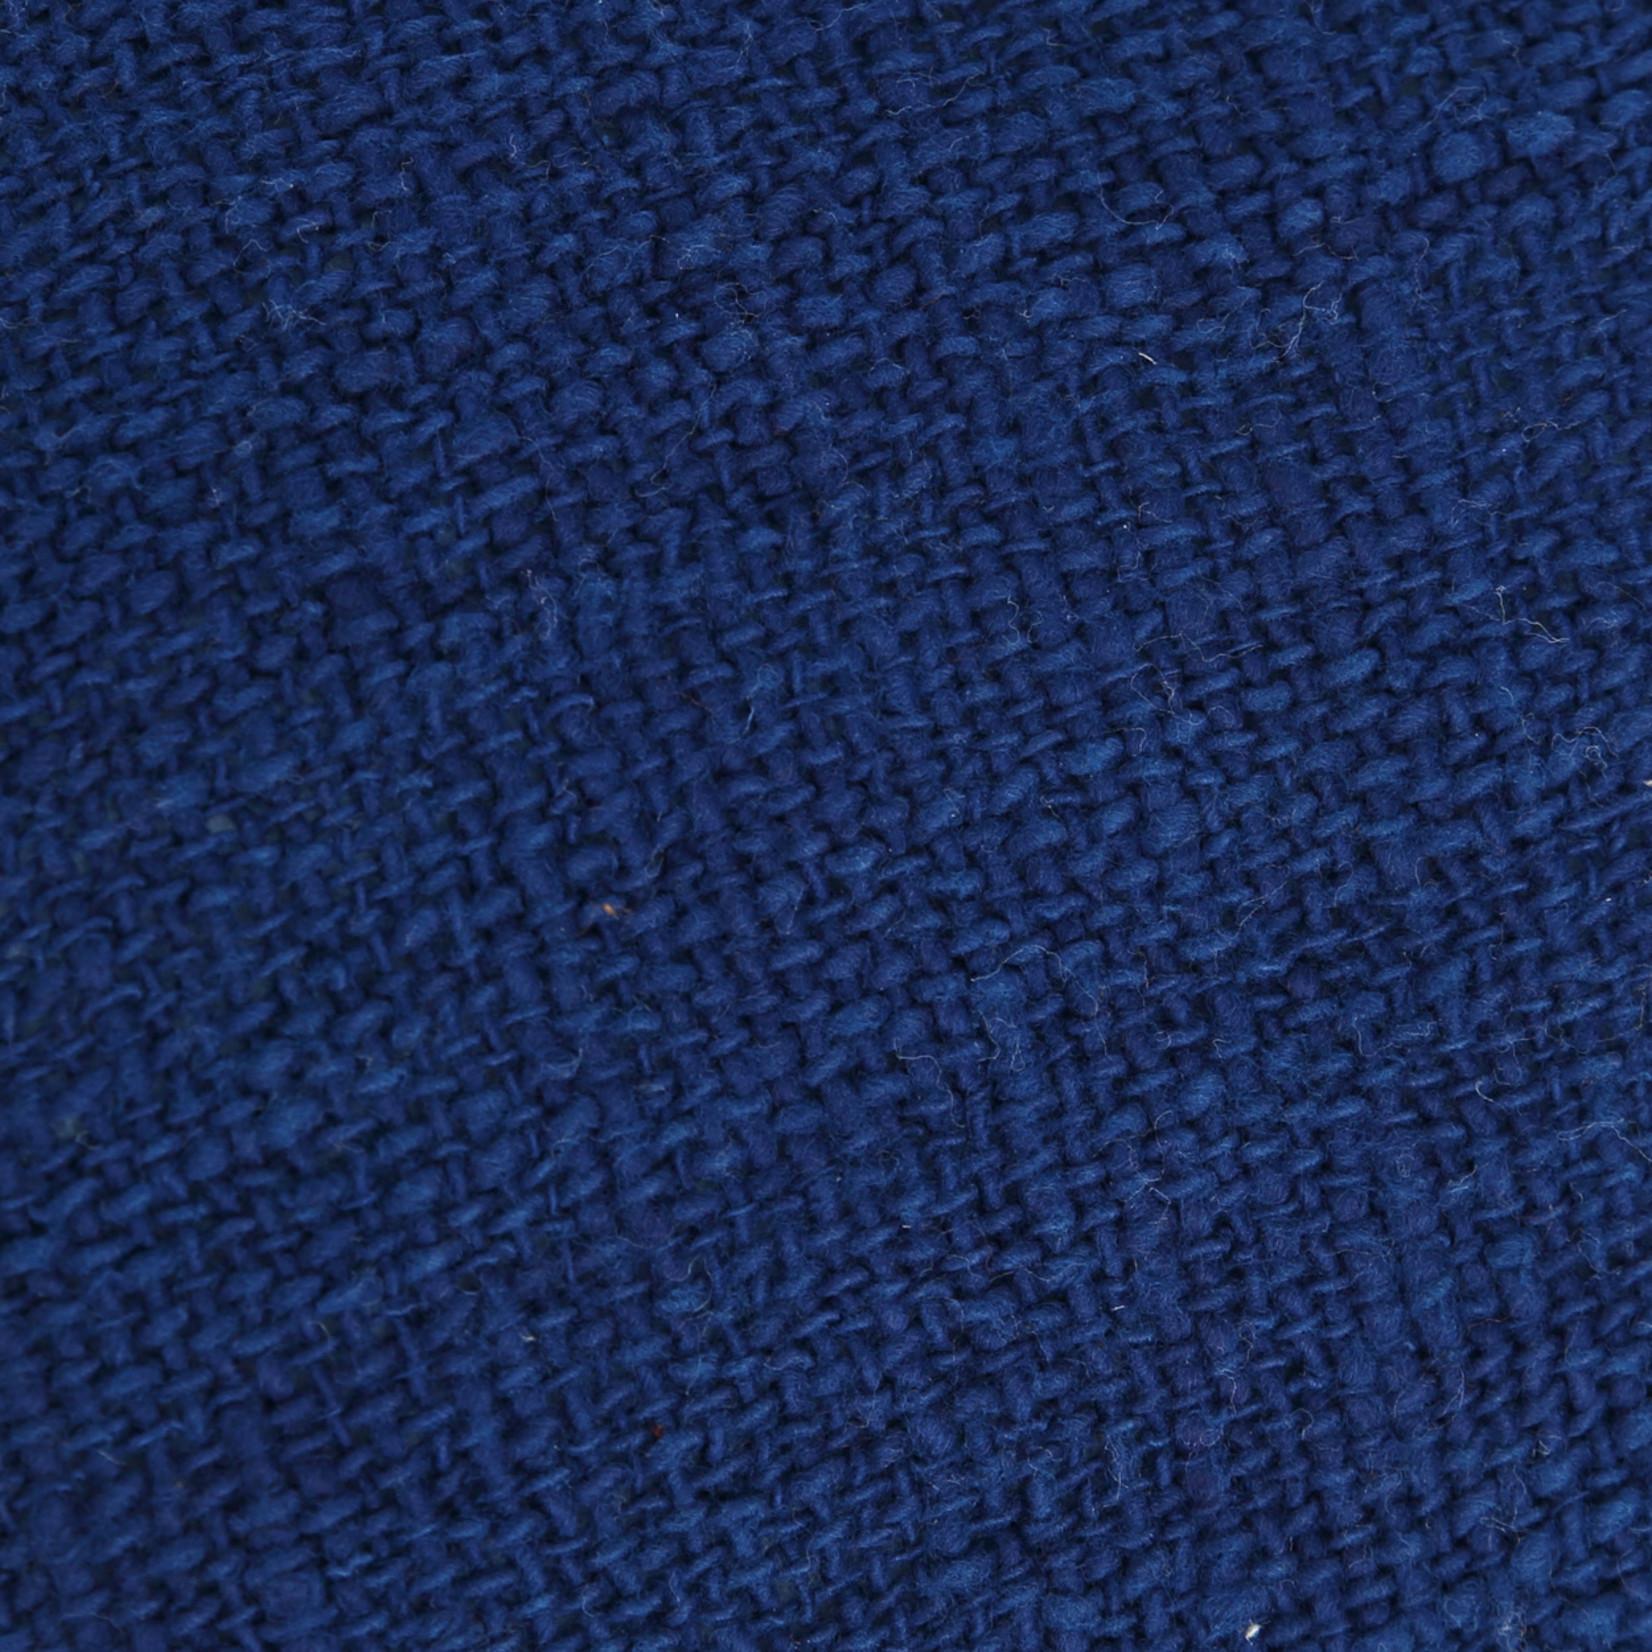 Bazar Bizar De Saint Tropez Kussenhoes - Blauw Naturel - 30x50